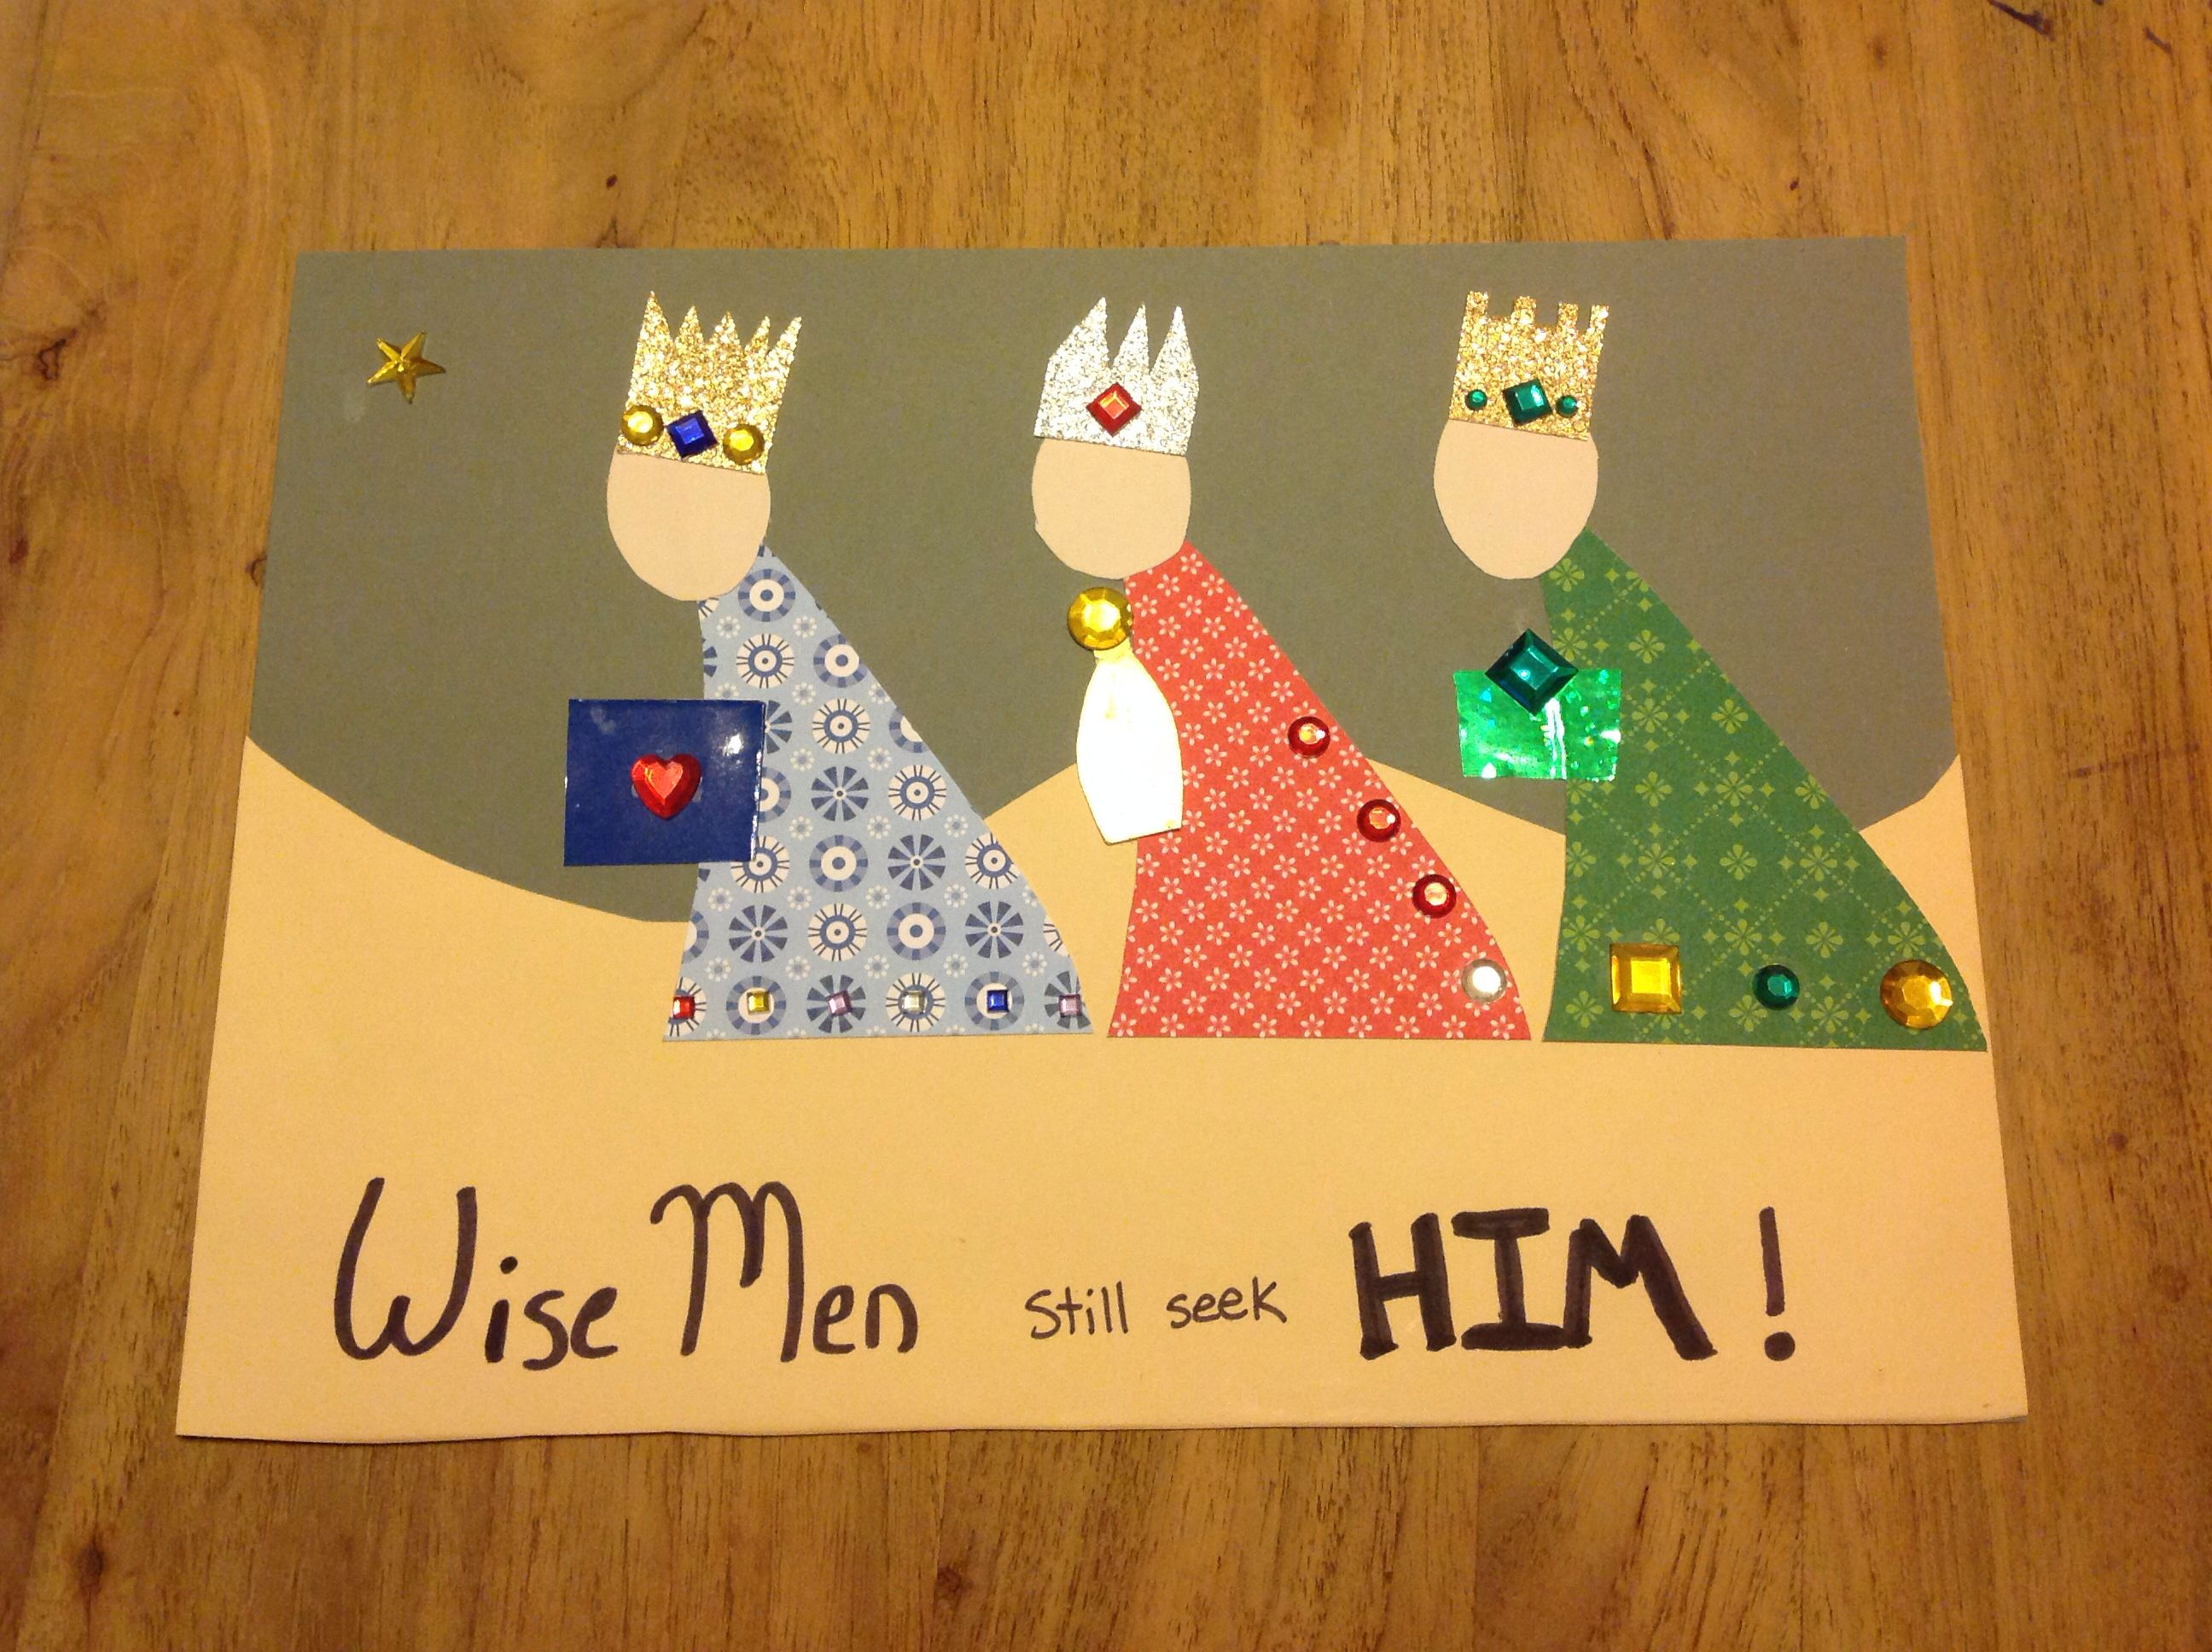 Wise men still seek him theme for this month kids church for Three wise men craft